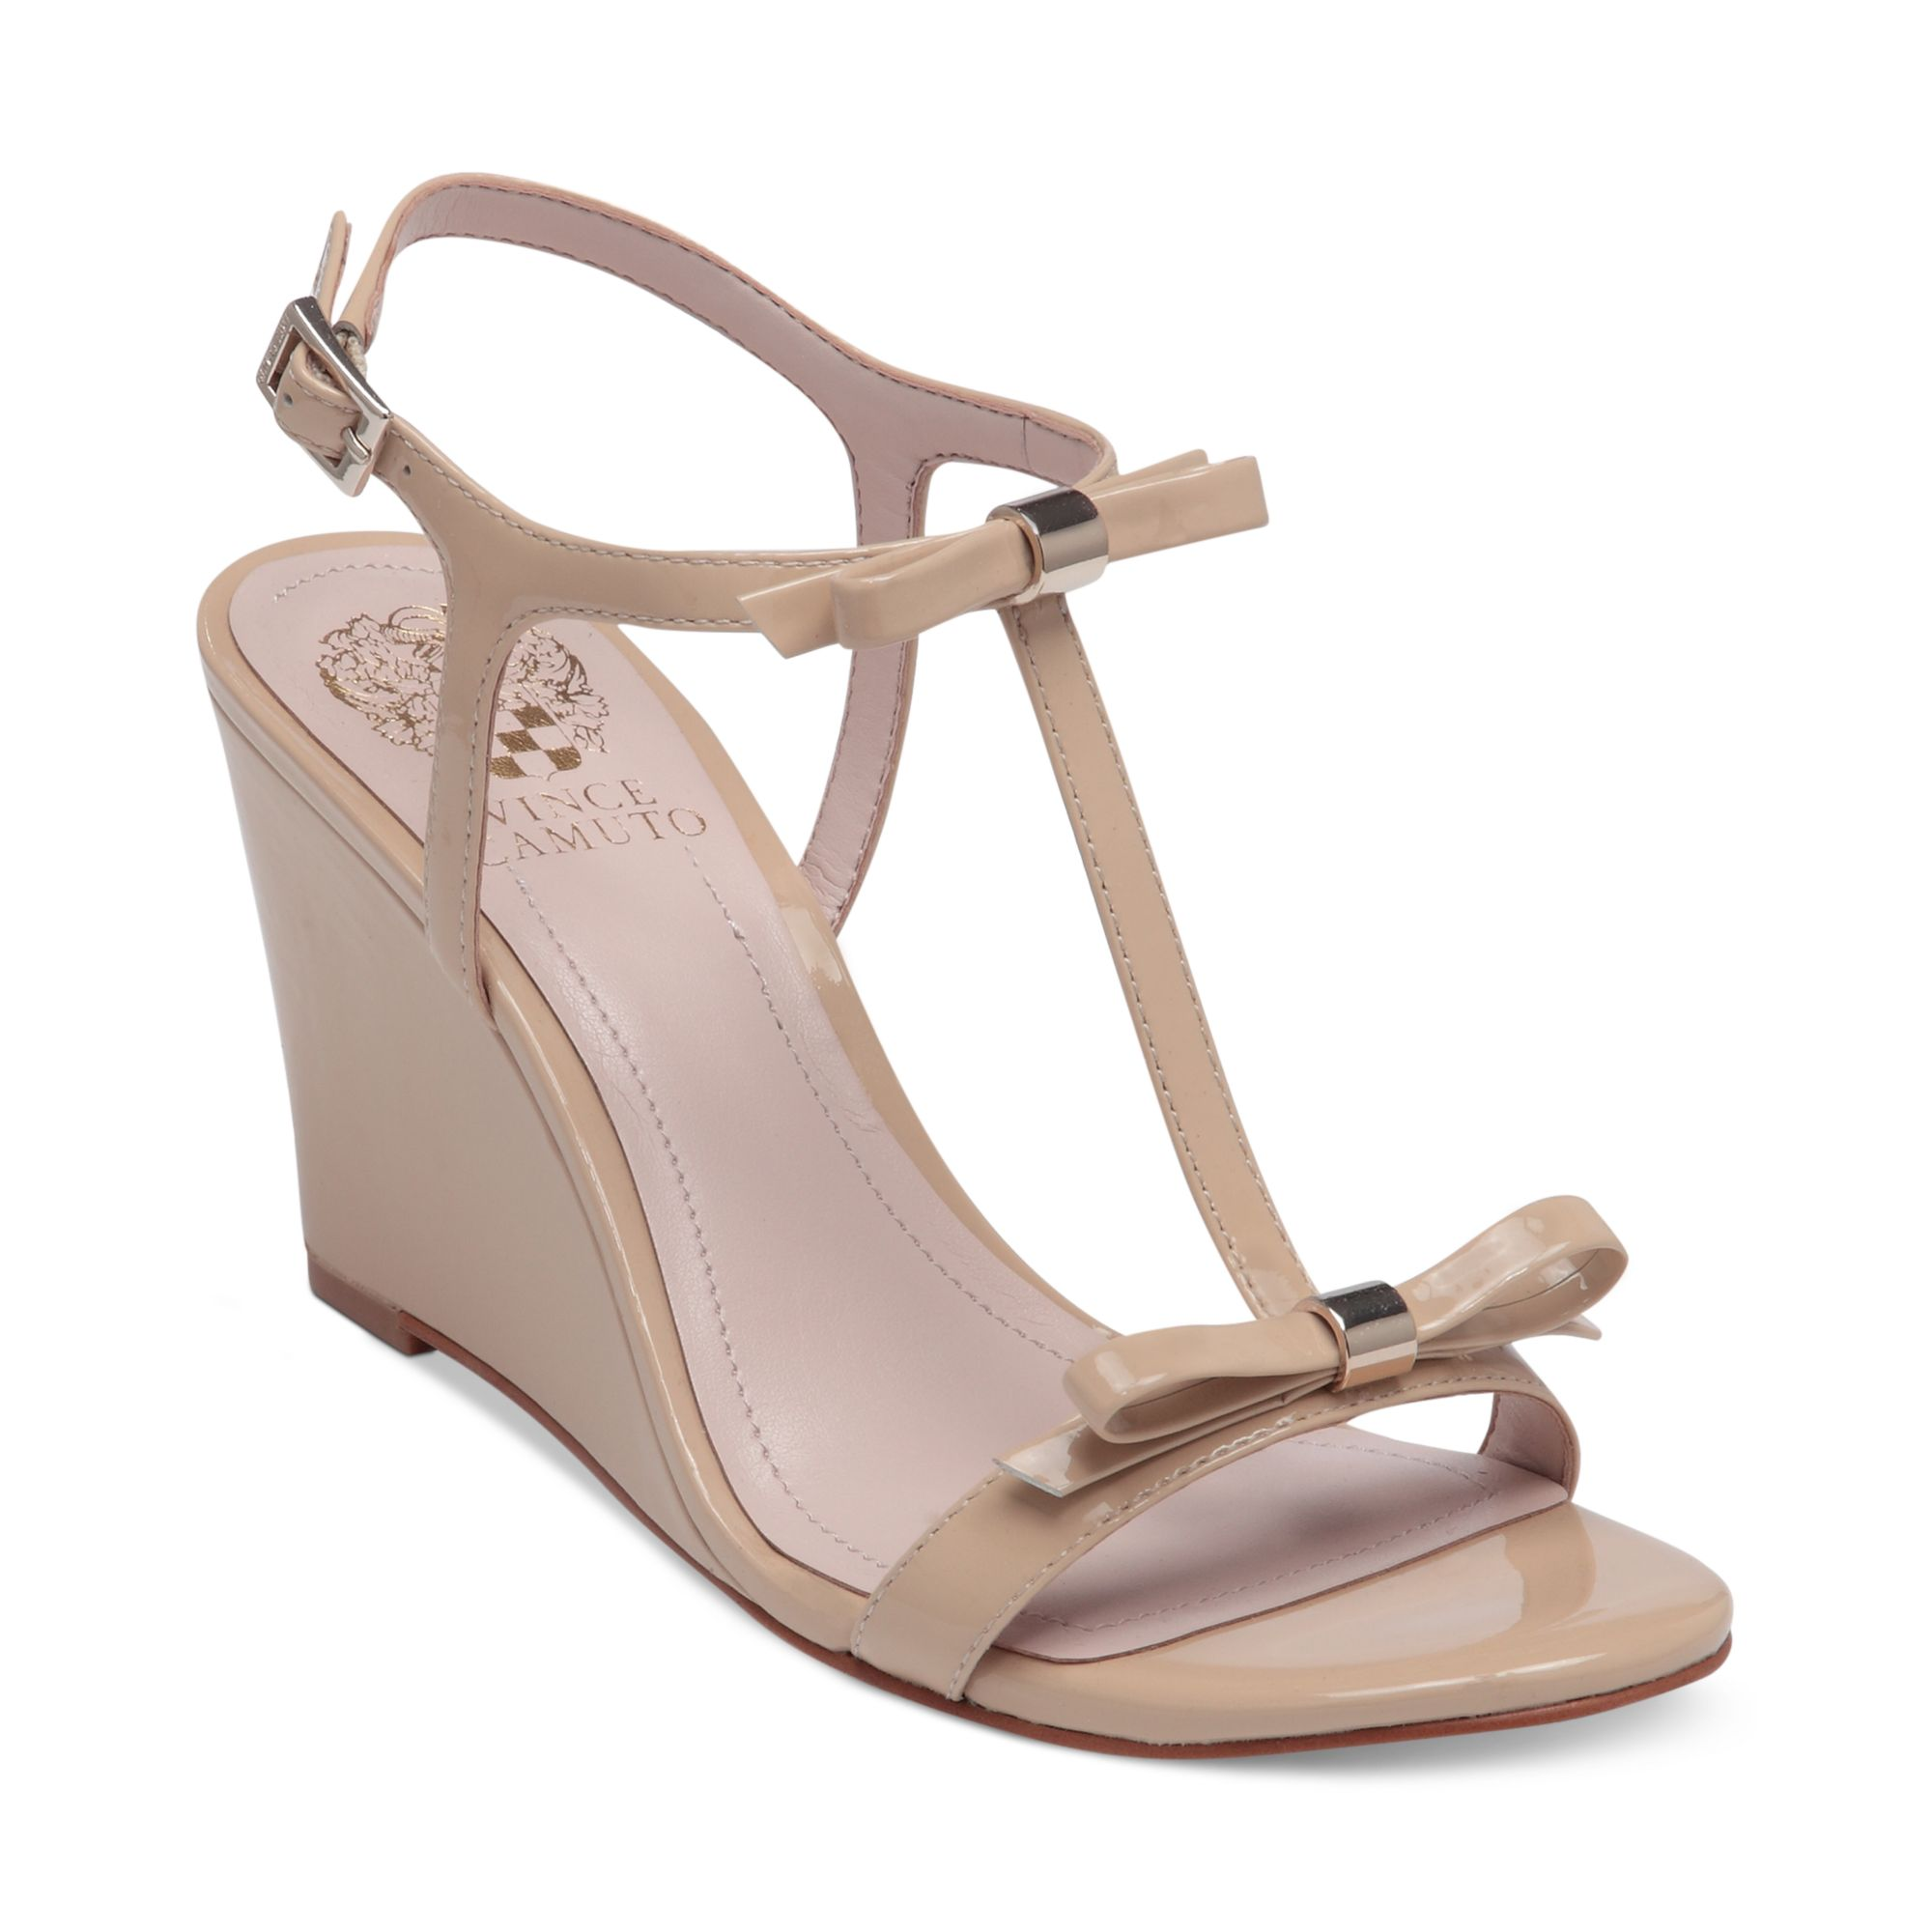 vince camuto hattel bow wedge sandals in beige petal lyst